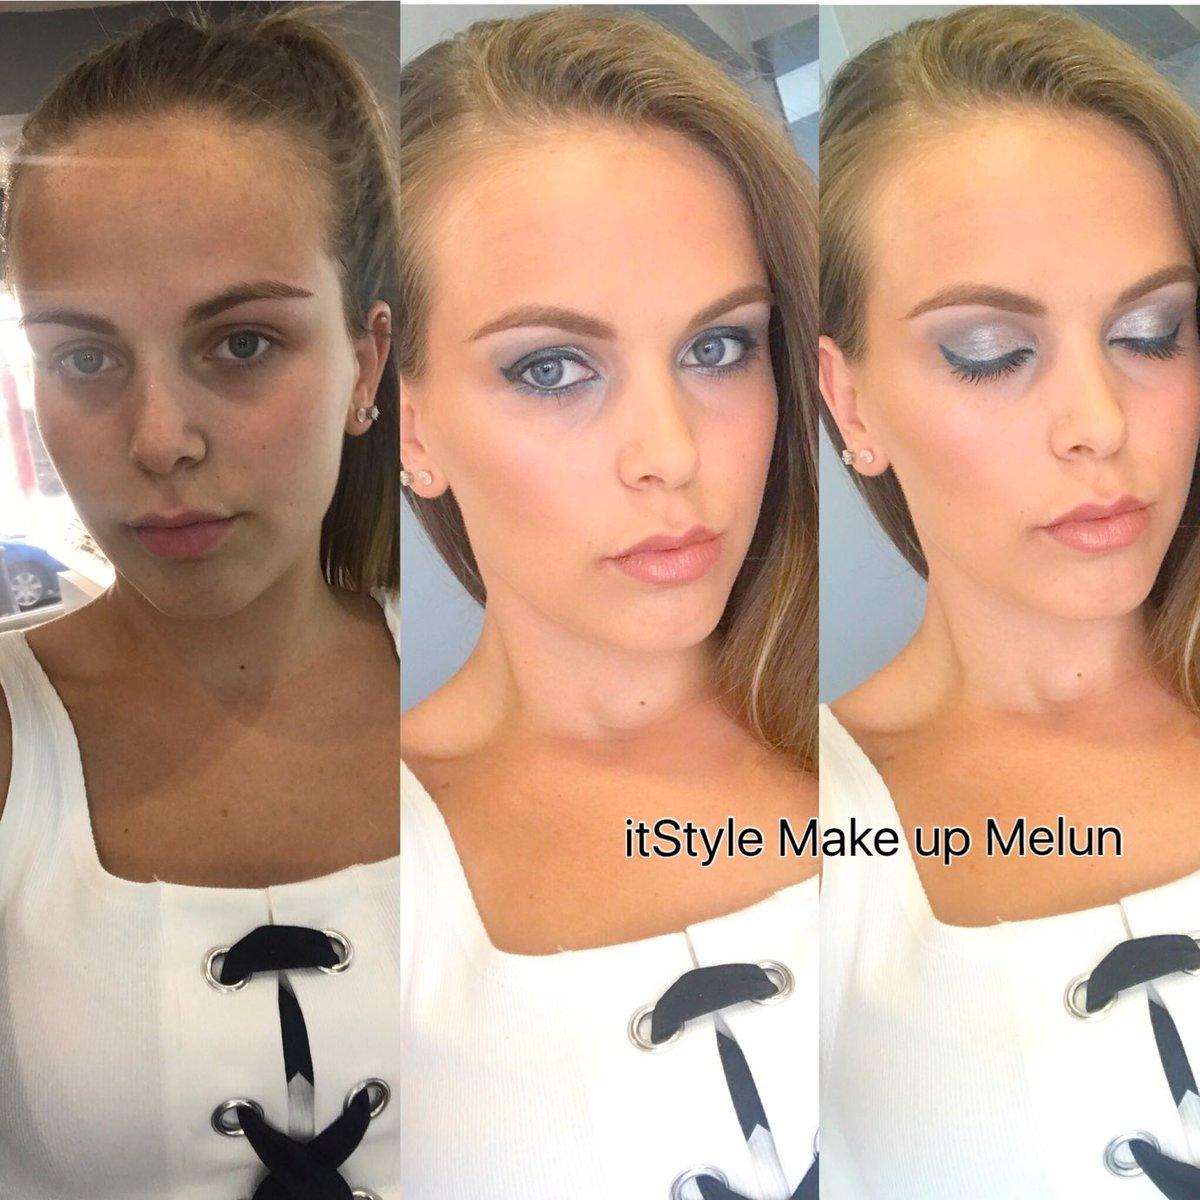 Before/after #itStylemakeup #makeup #beauty #beauté #Paris #melun #fashion<br>http://pic.twitter.com/XgZGFObpU8